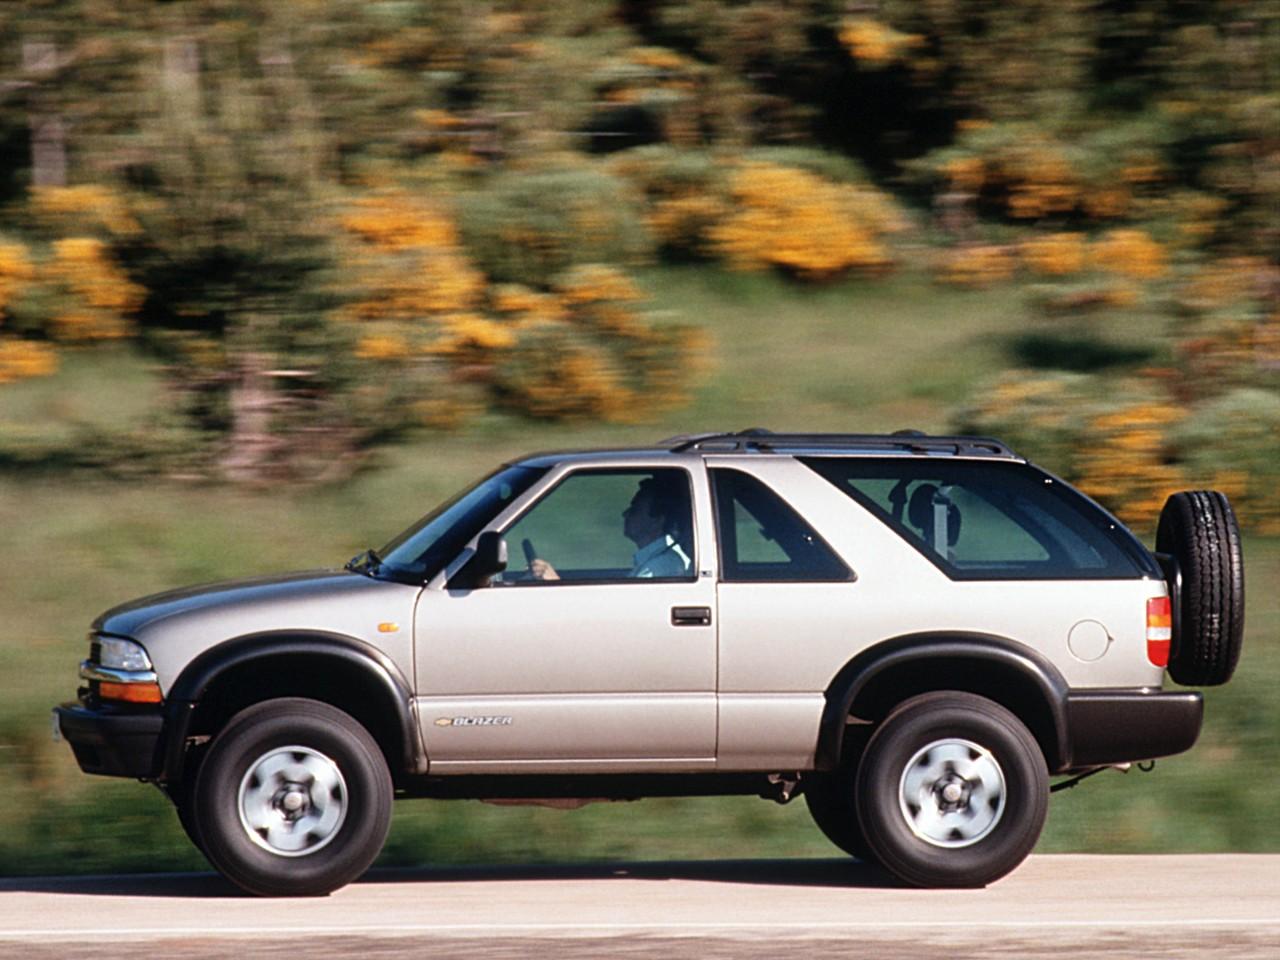 CHEVROLET Blazer 3 doors specs & photos - 1995, 1996, 1997 ...